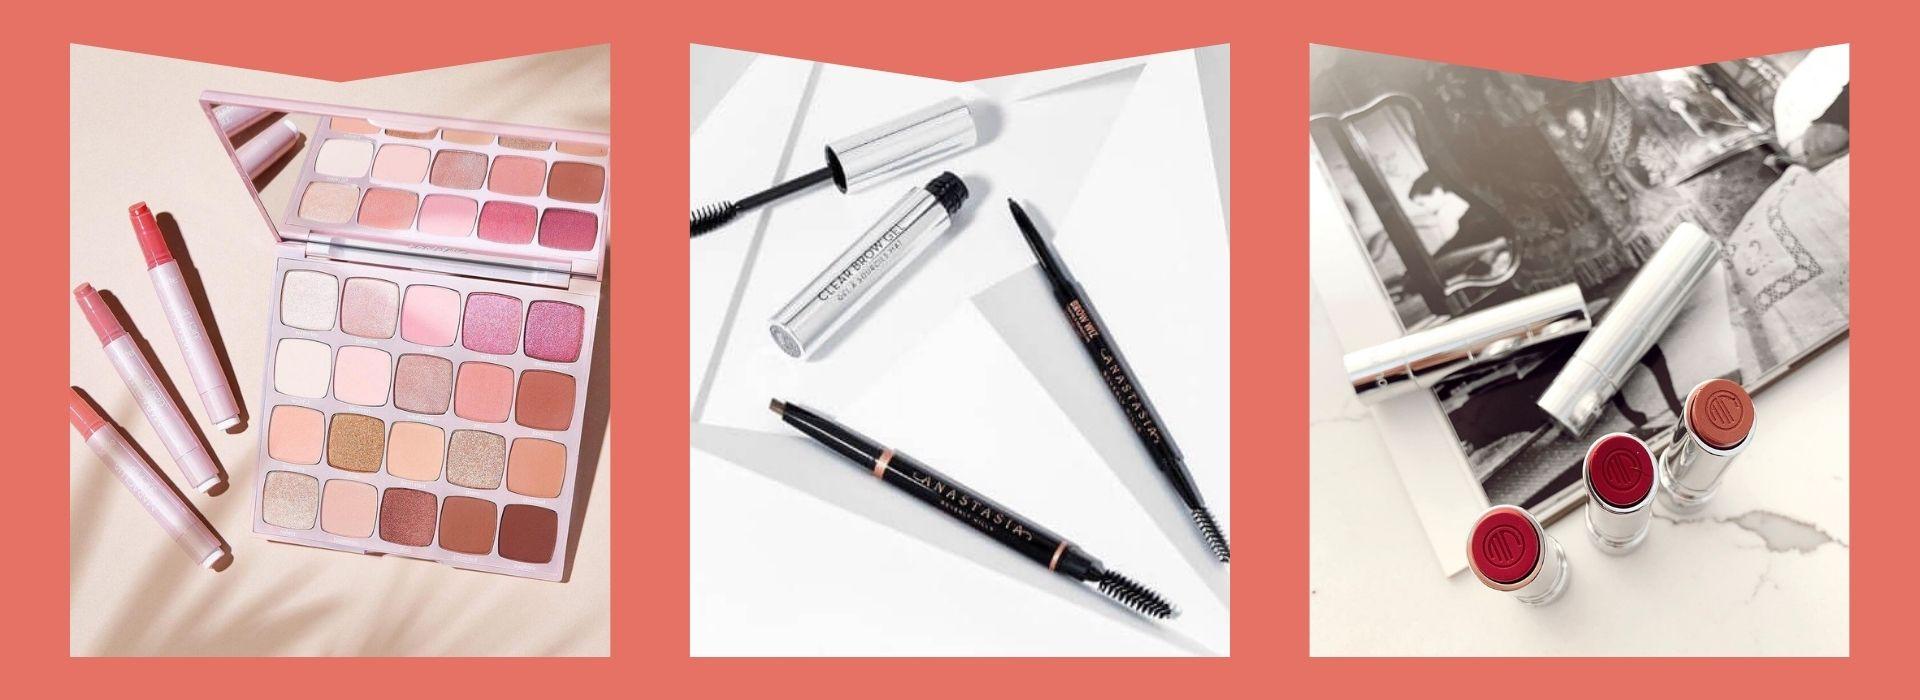 Eyeshadow palette, eyebrow pencil, lipstick